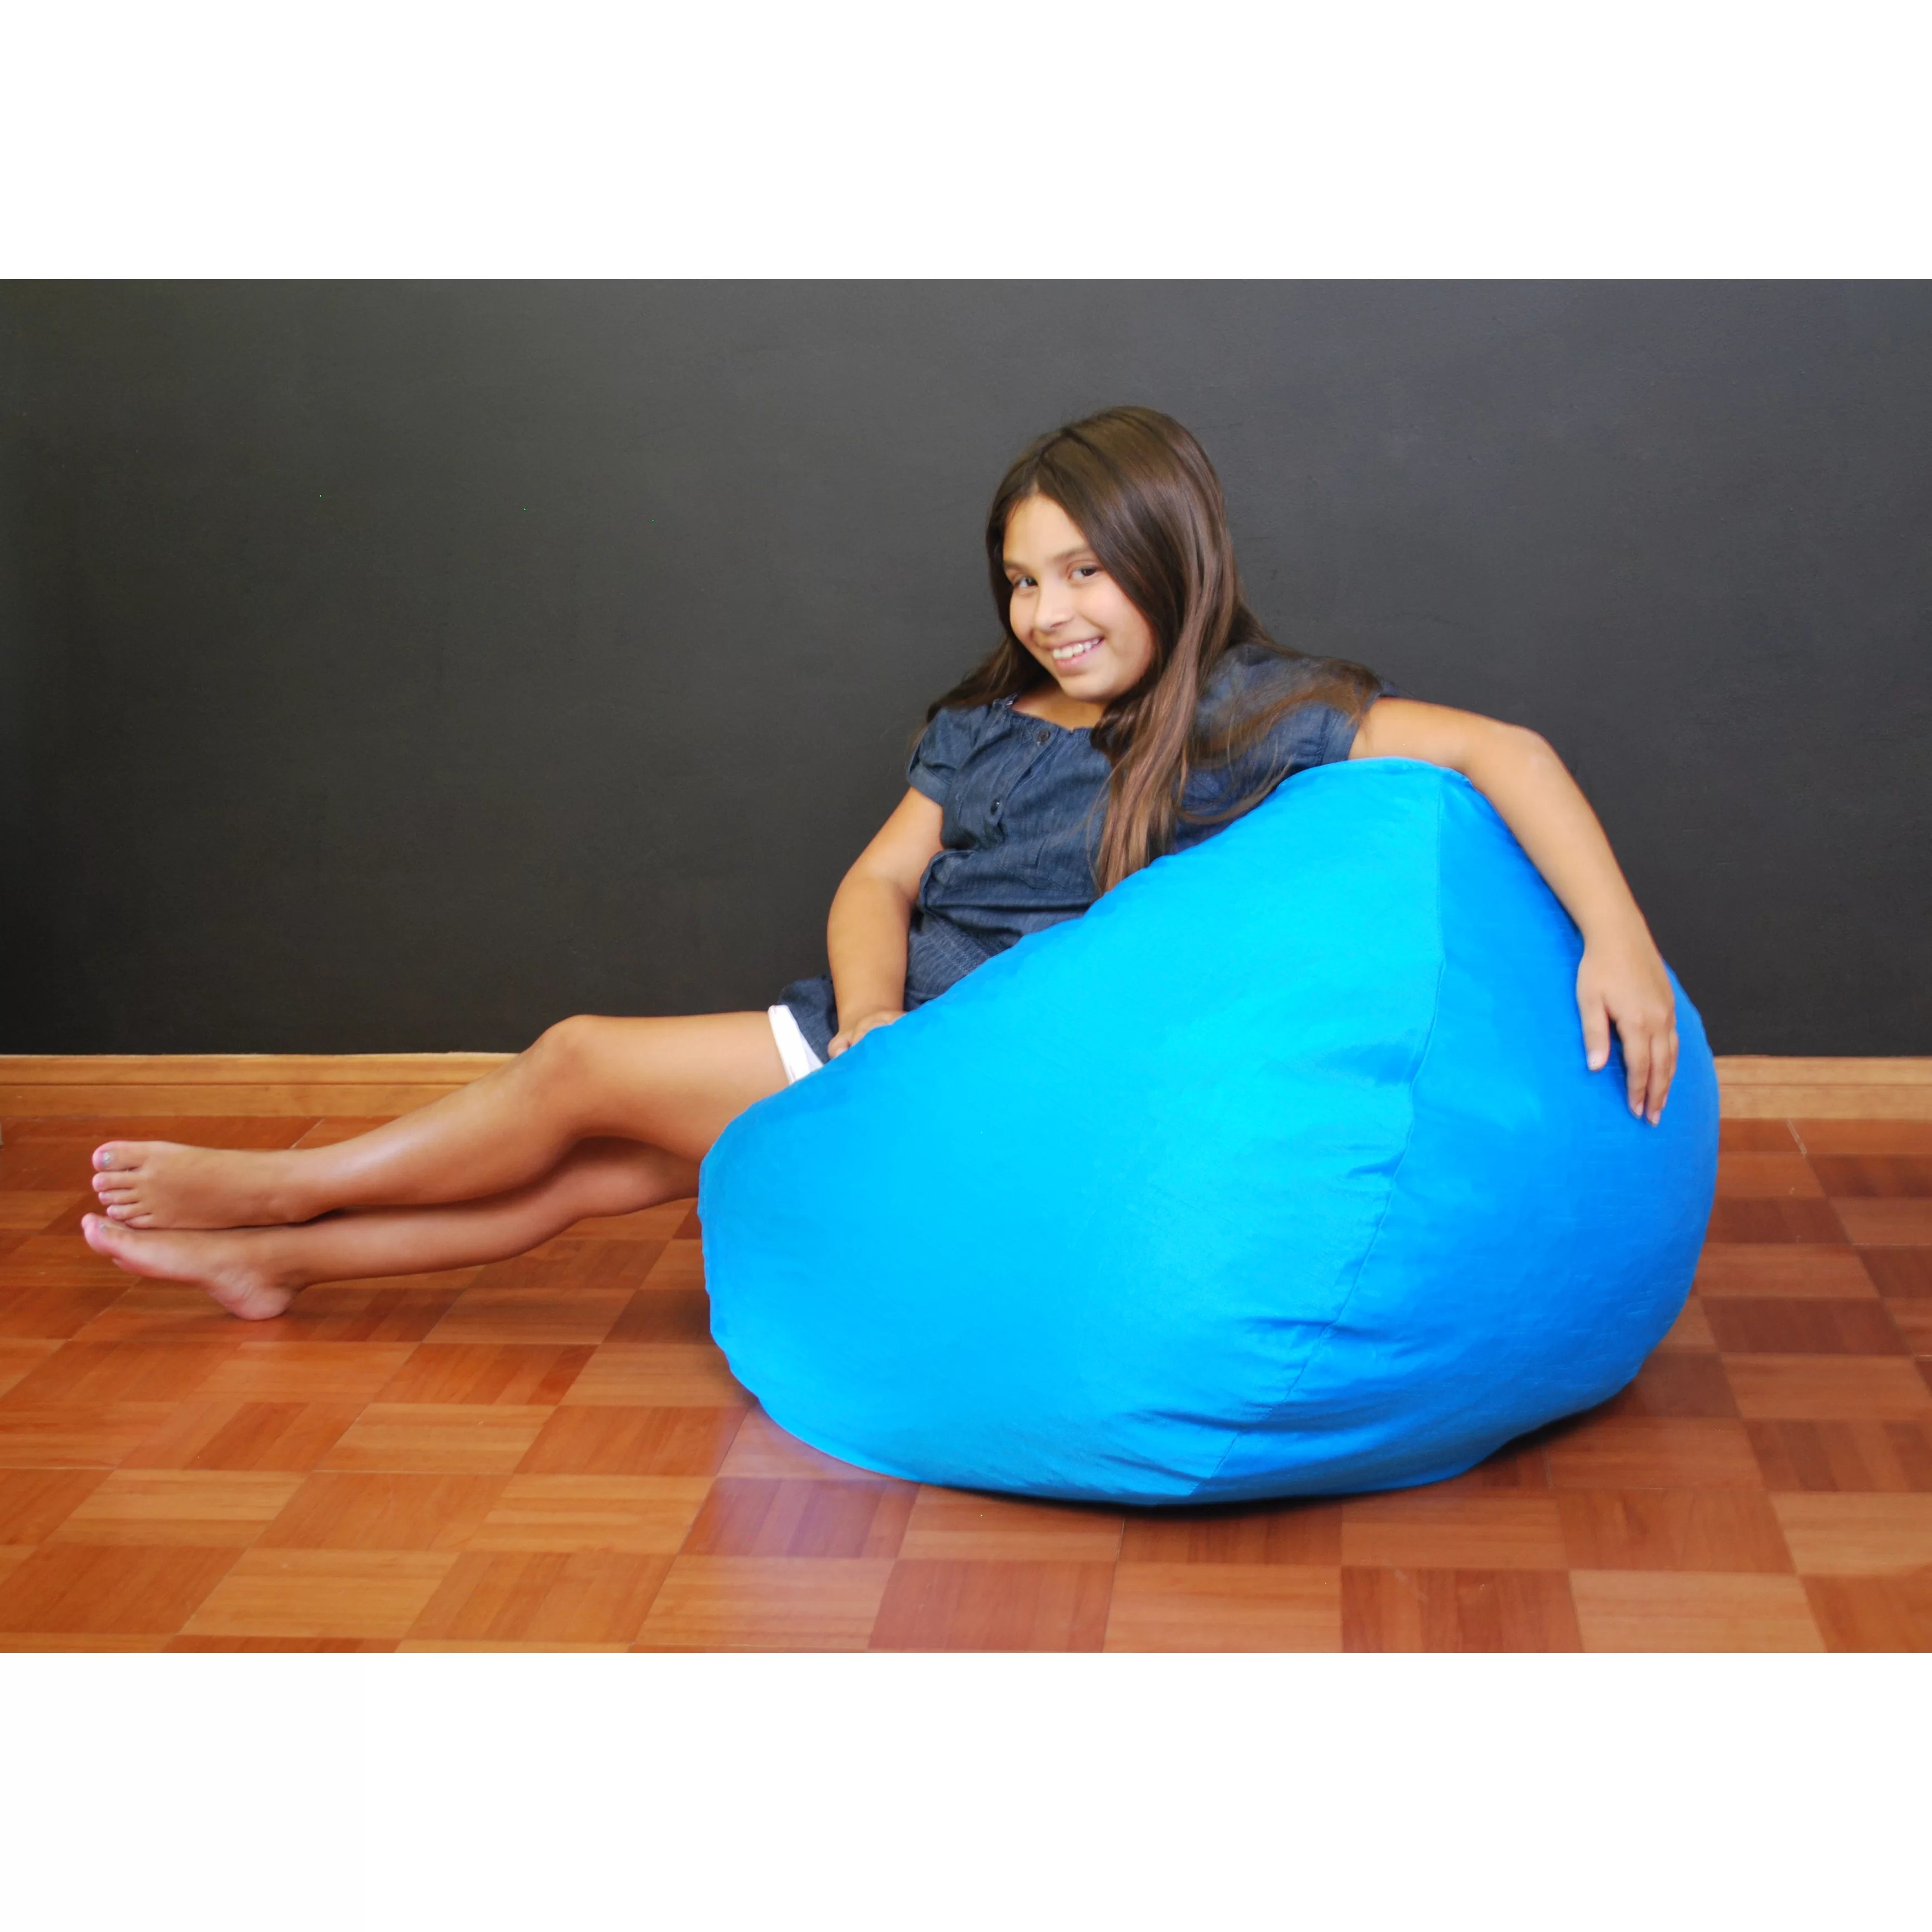 blue bean bag chair ikea kivik fun factory wayfair